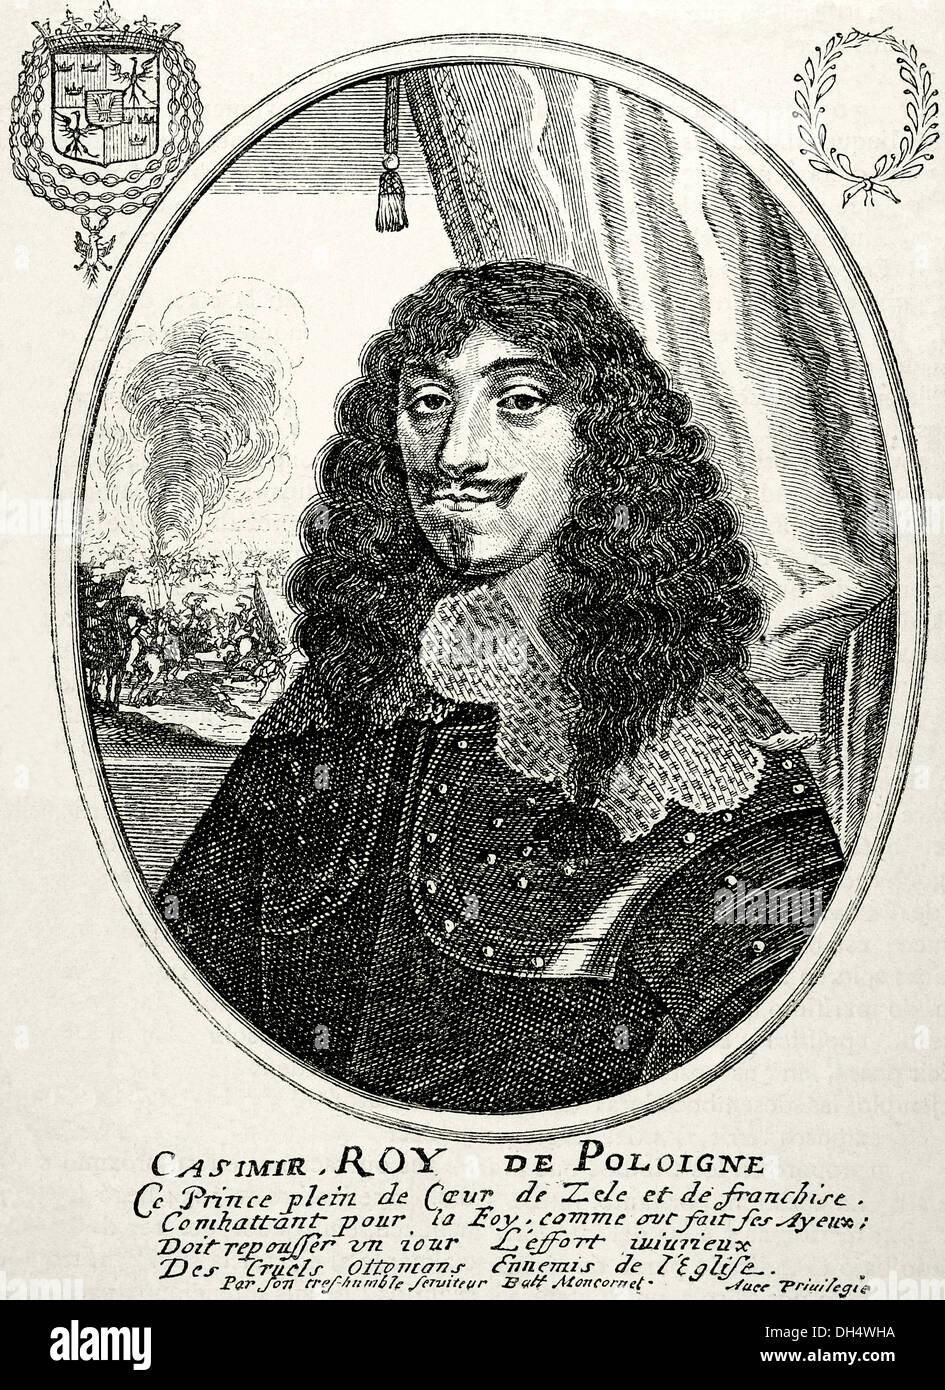 John II Casimir, King of Poland (1609-1672). Engraving by B. Moncornet 'Historia Universal', 1885. - Stock Image